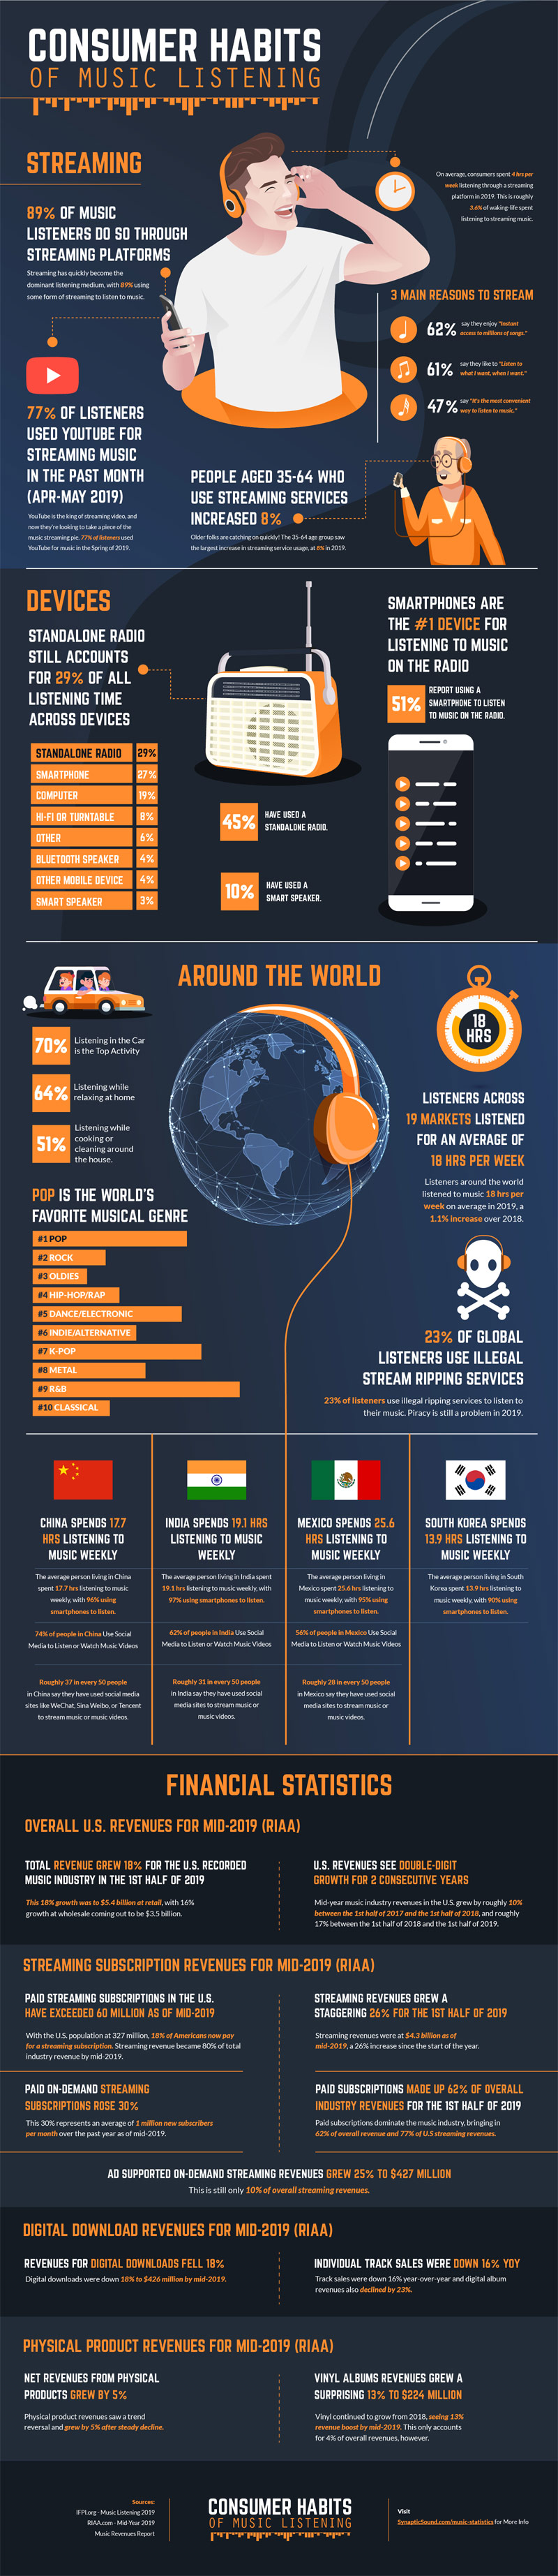 Consumer Habits of Music Listening #ifographic